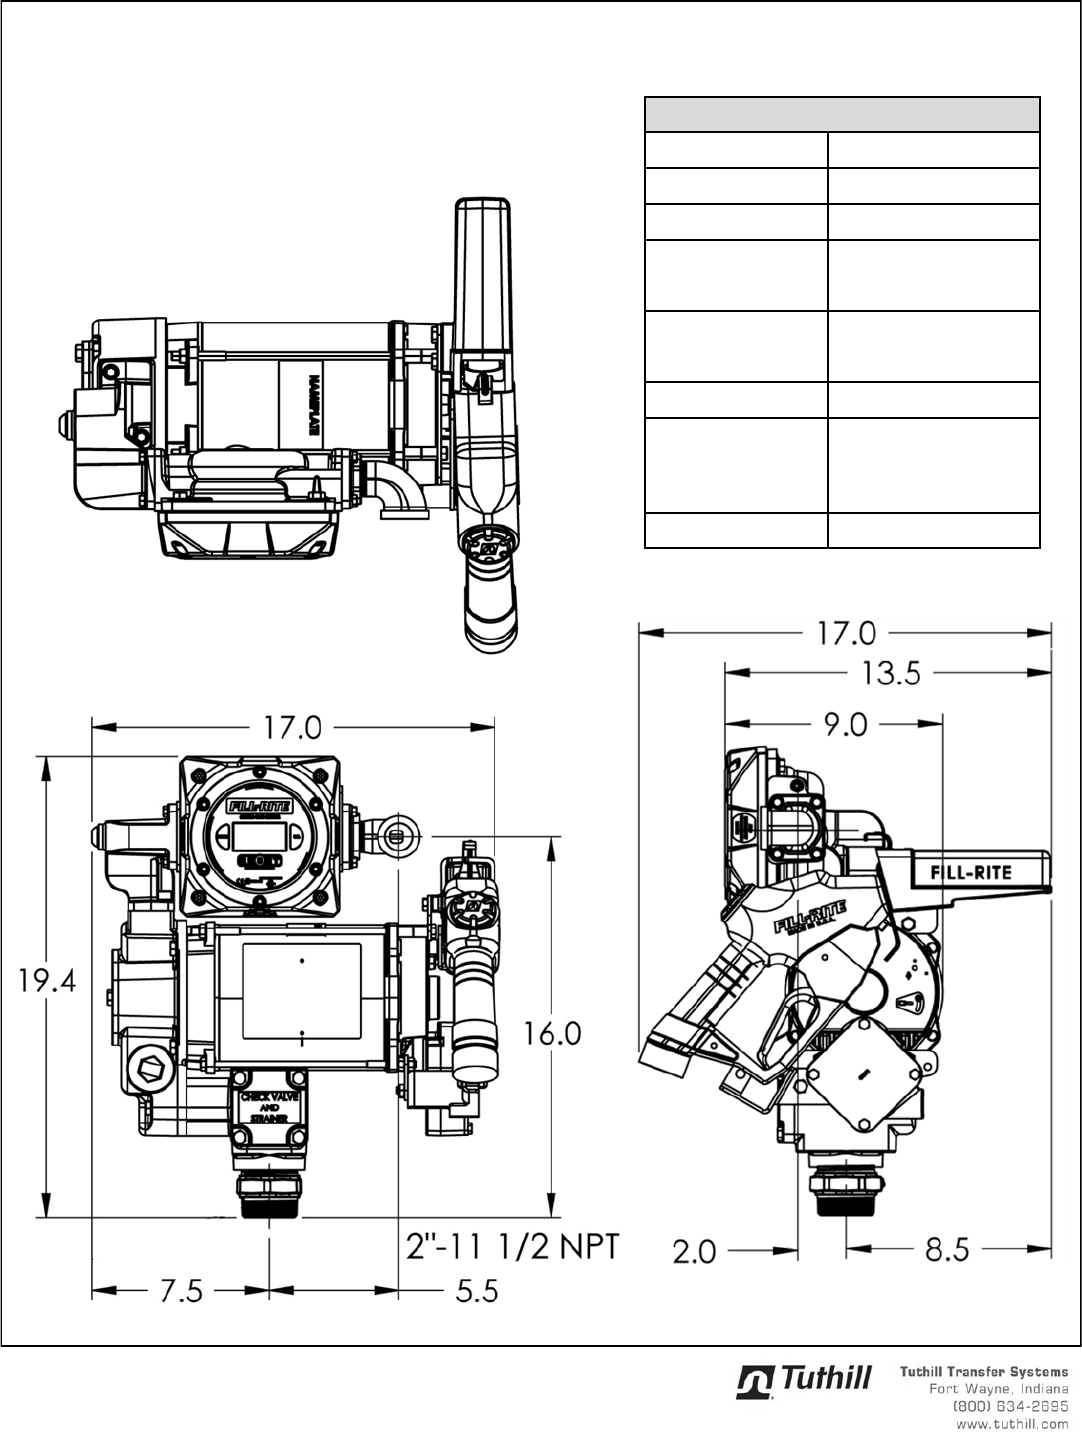 30 Fill Rite Pump Wiring Diagram